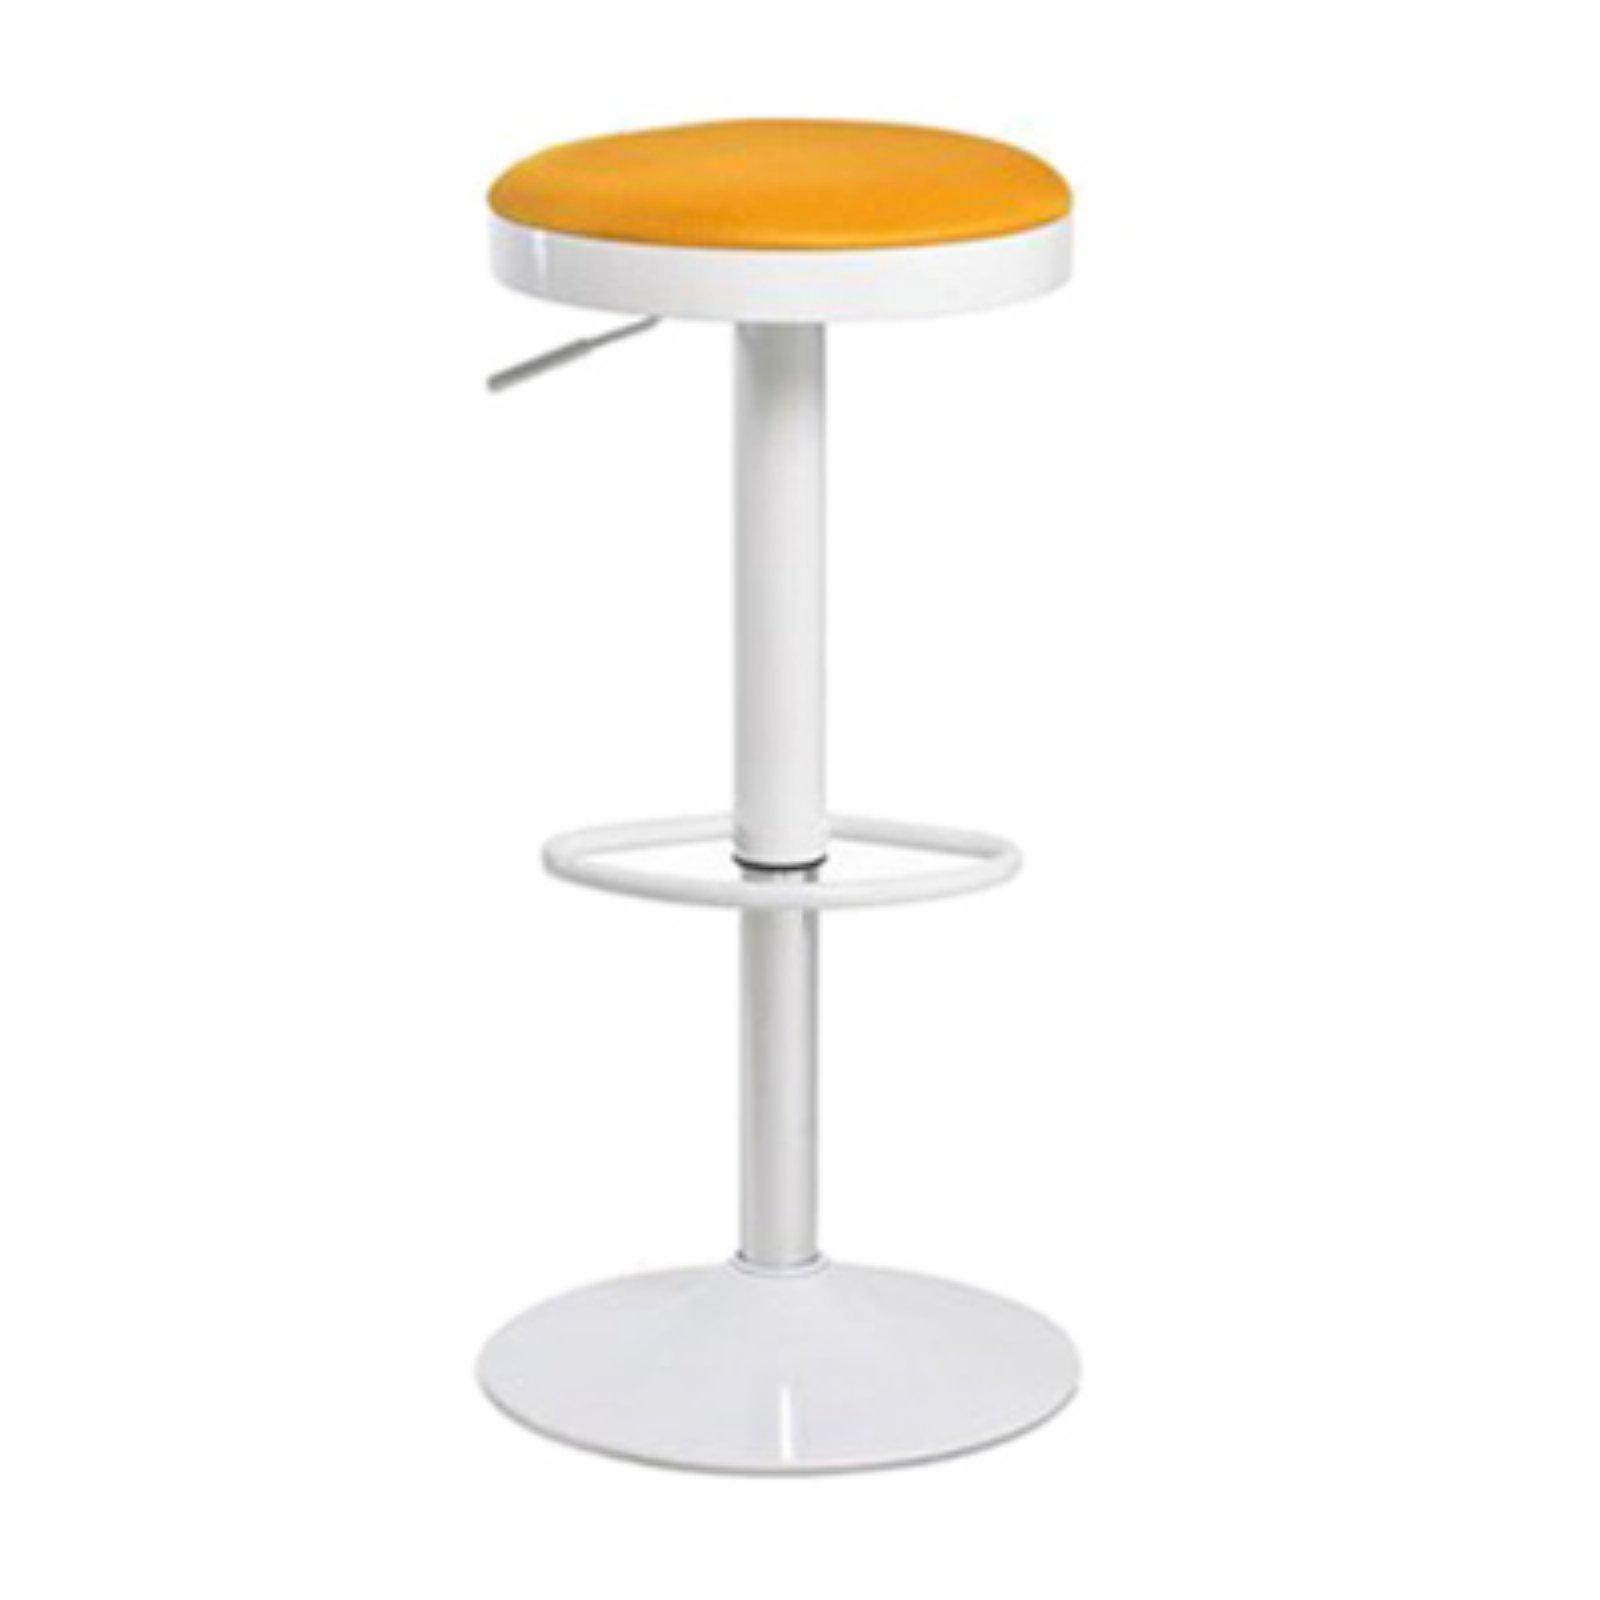 Image of Aeon Furniture Carrie Gas Lift Swivel Backless Bar Stools - Orange - Set of 2